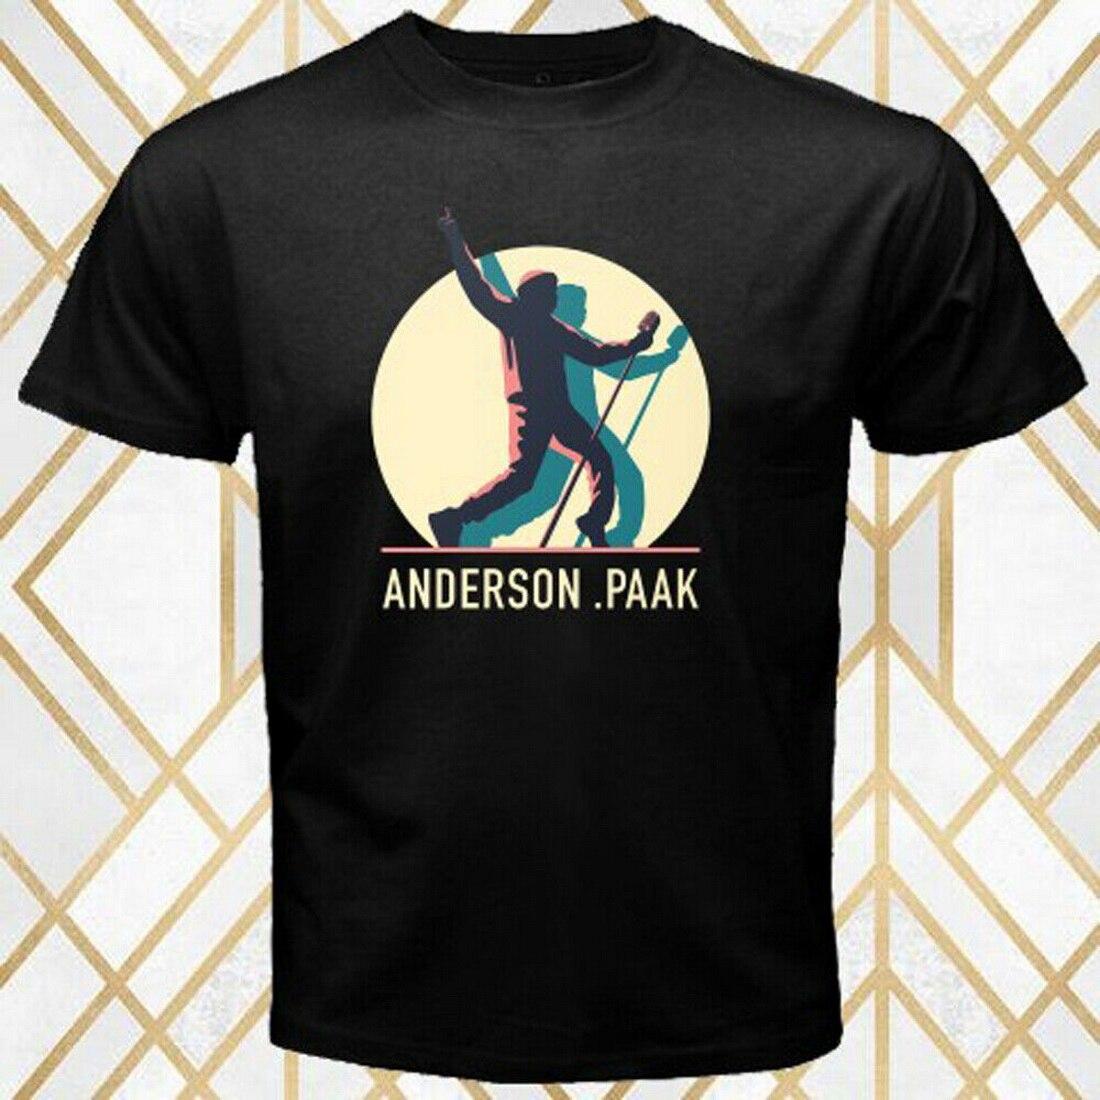 Anderson .Paak Andys Beach Tour Musician Logo Mens Black Tops Tee T Shirt Size S 3XL T-Shirt 20th 30th 40th 50th Birthday